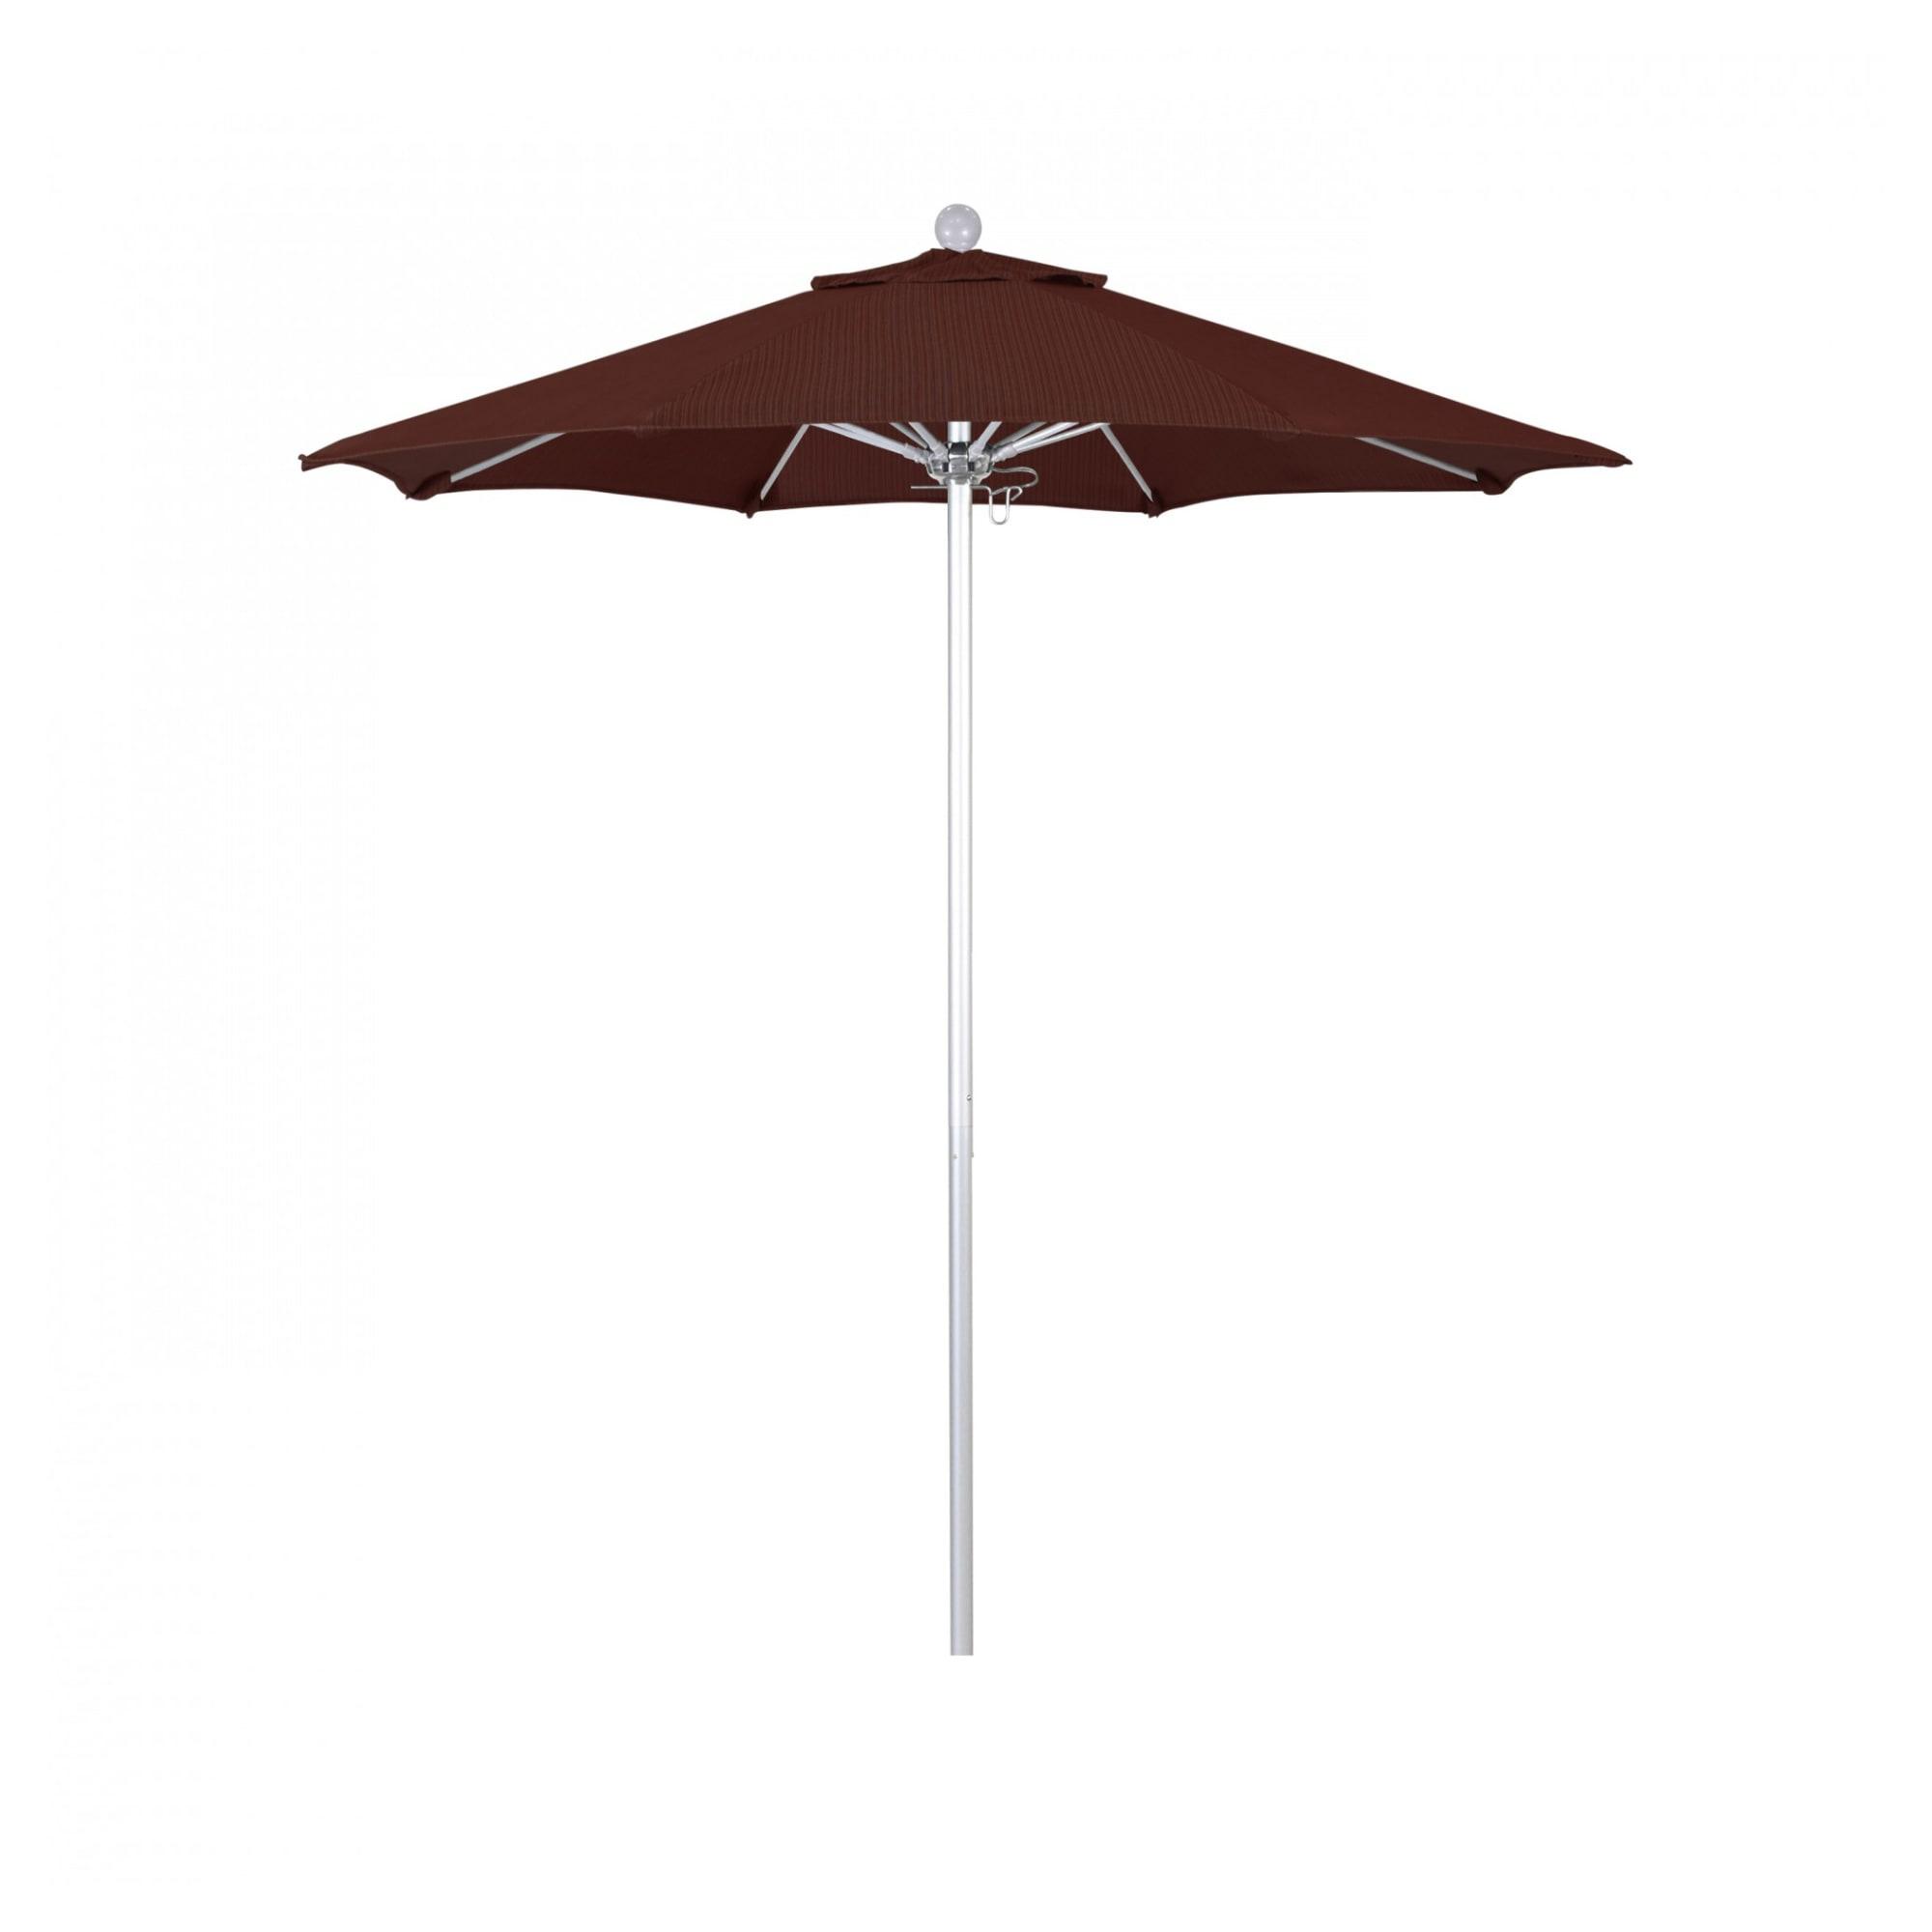 7.5 ft Casey Silver Anodized Aluminum Commercial Umbrella with 7.5 ft Casey Silver Anodized Aluminum Commercial Umbrella